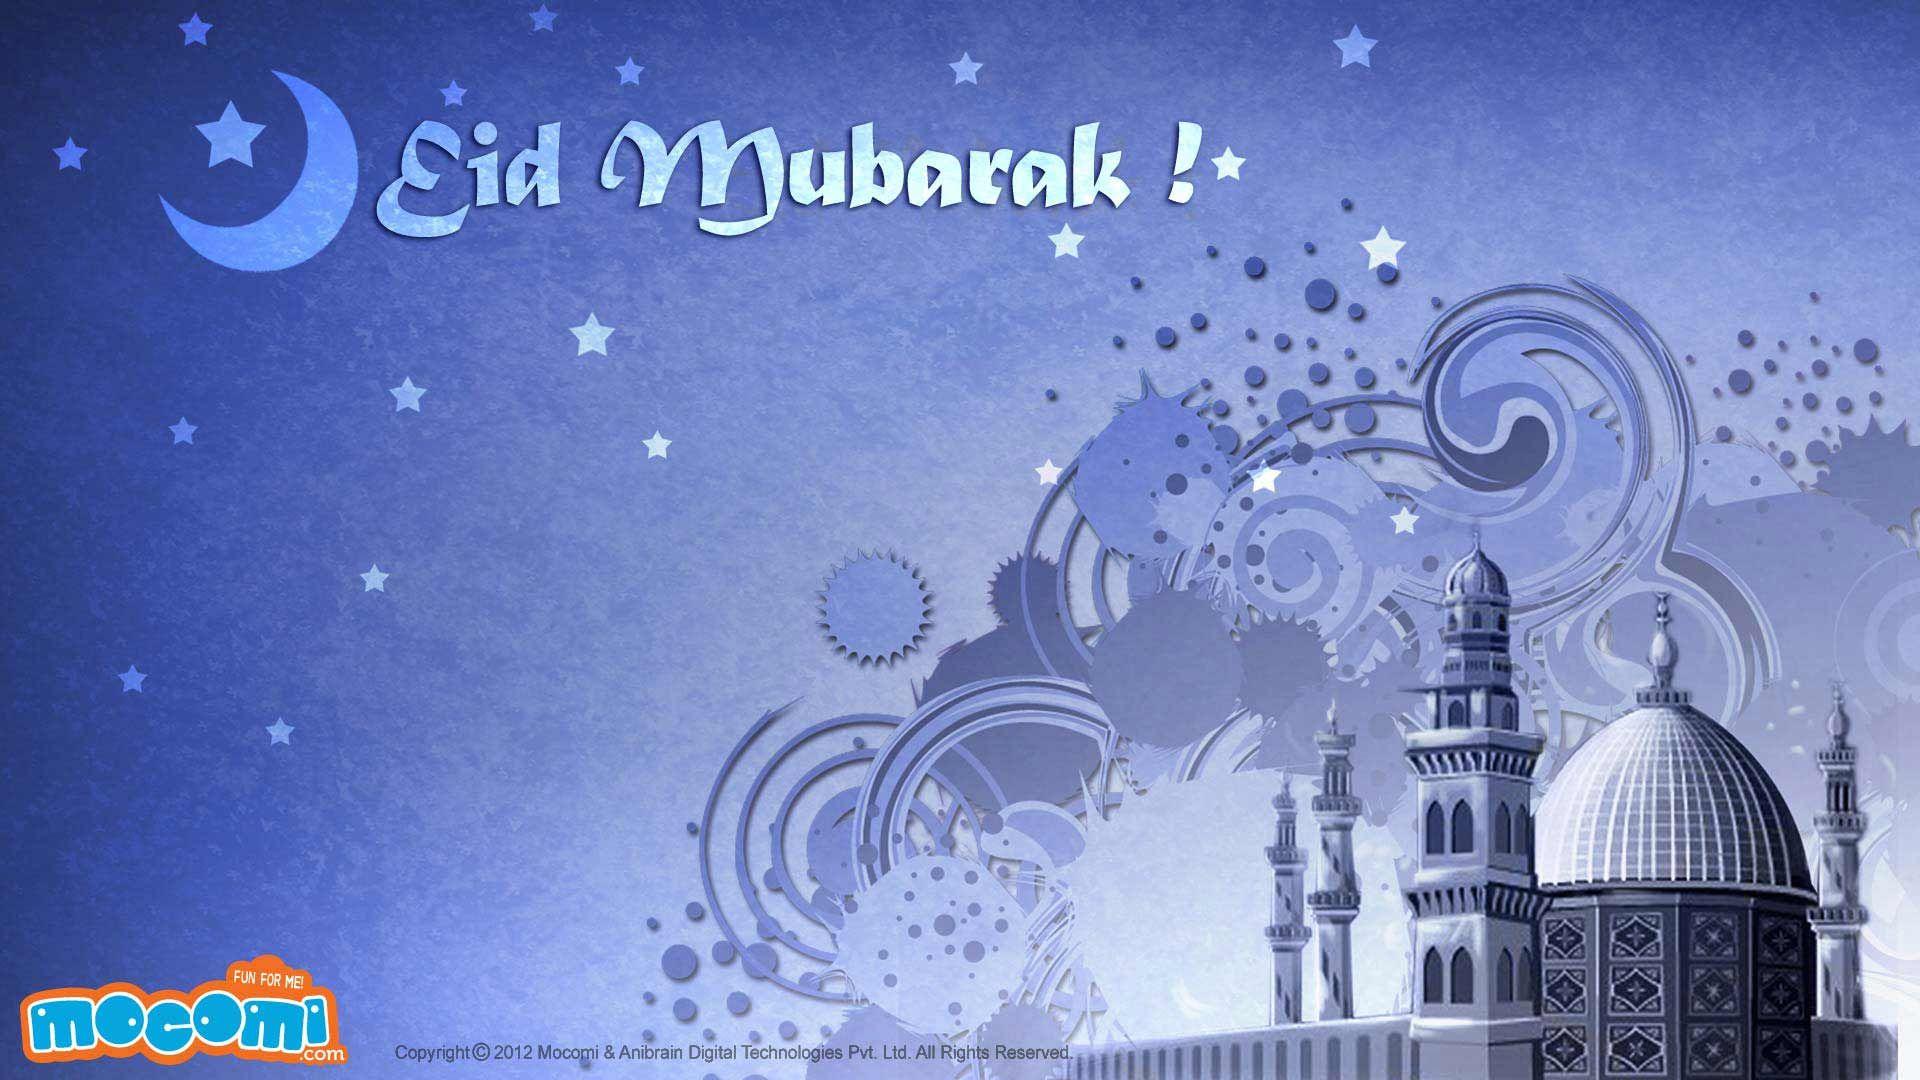 Eid Mubarak 02 Desktop Wallpapers For Kids Mocomi Eid Images Eid Wallpaper Eid Mubarak